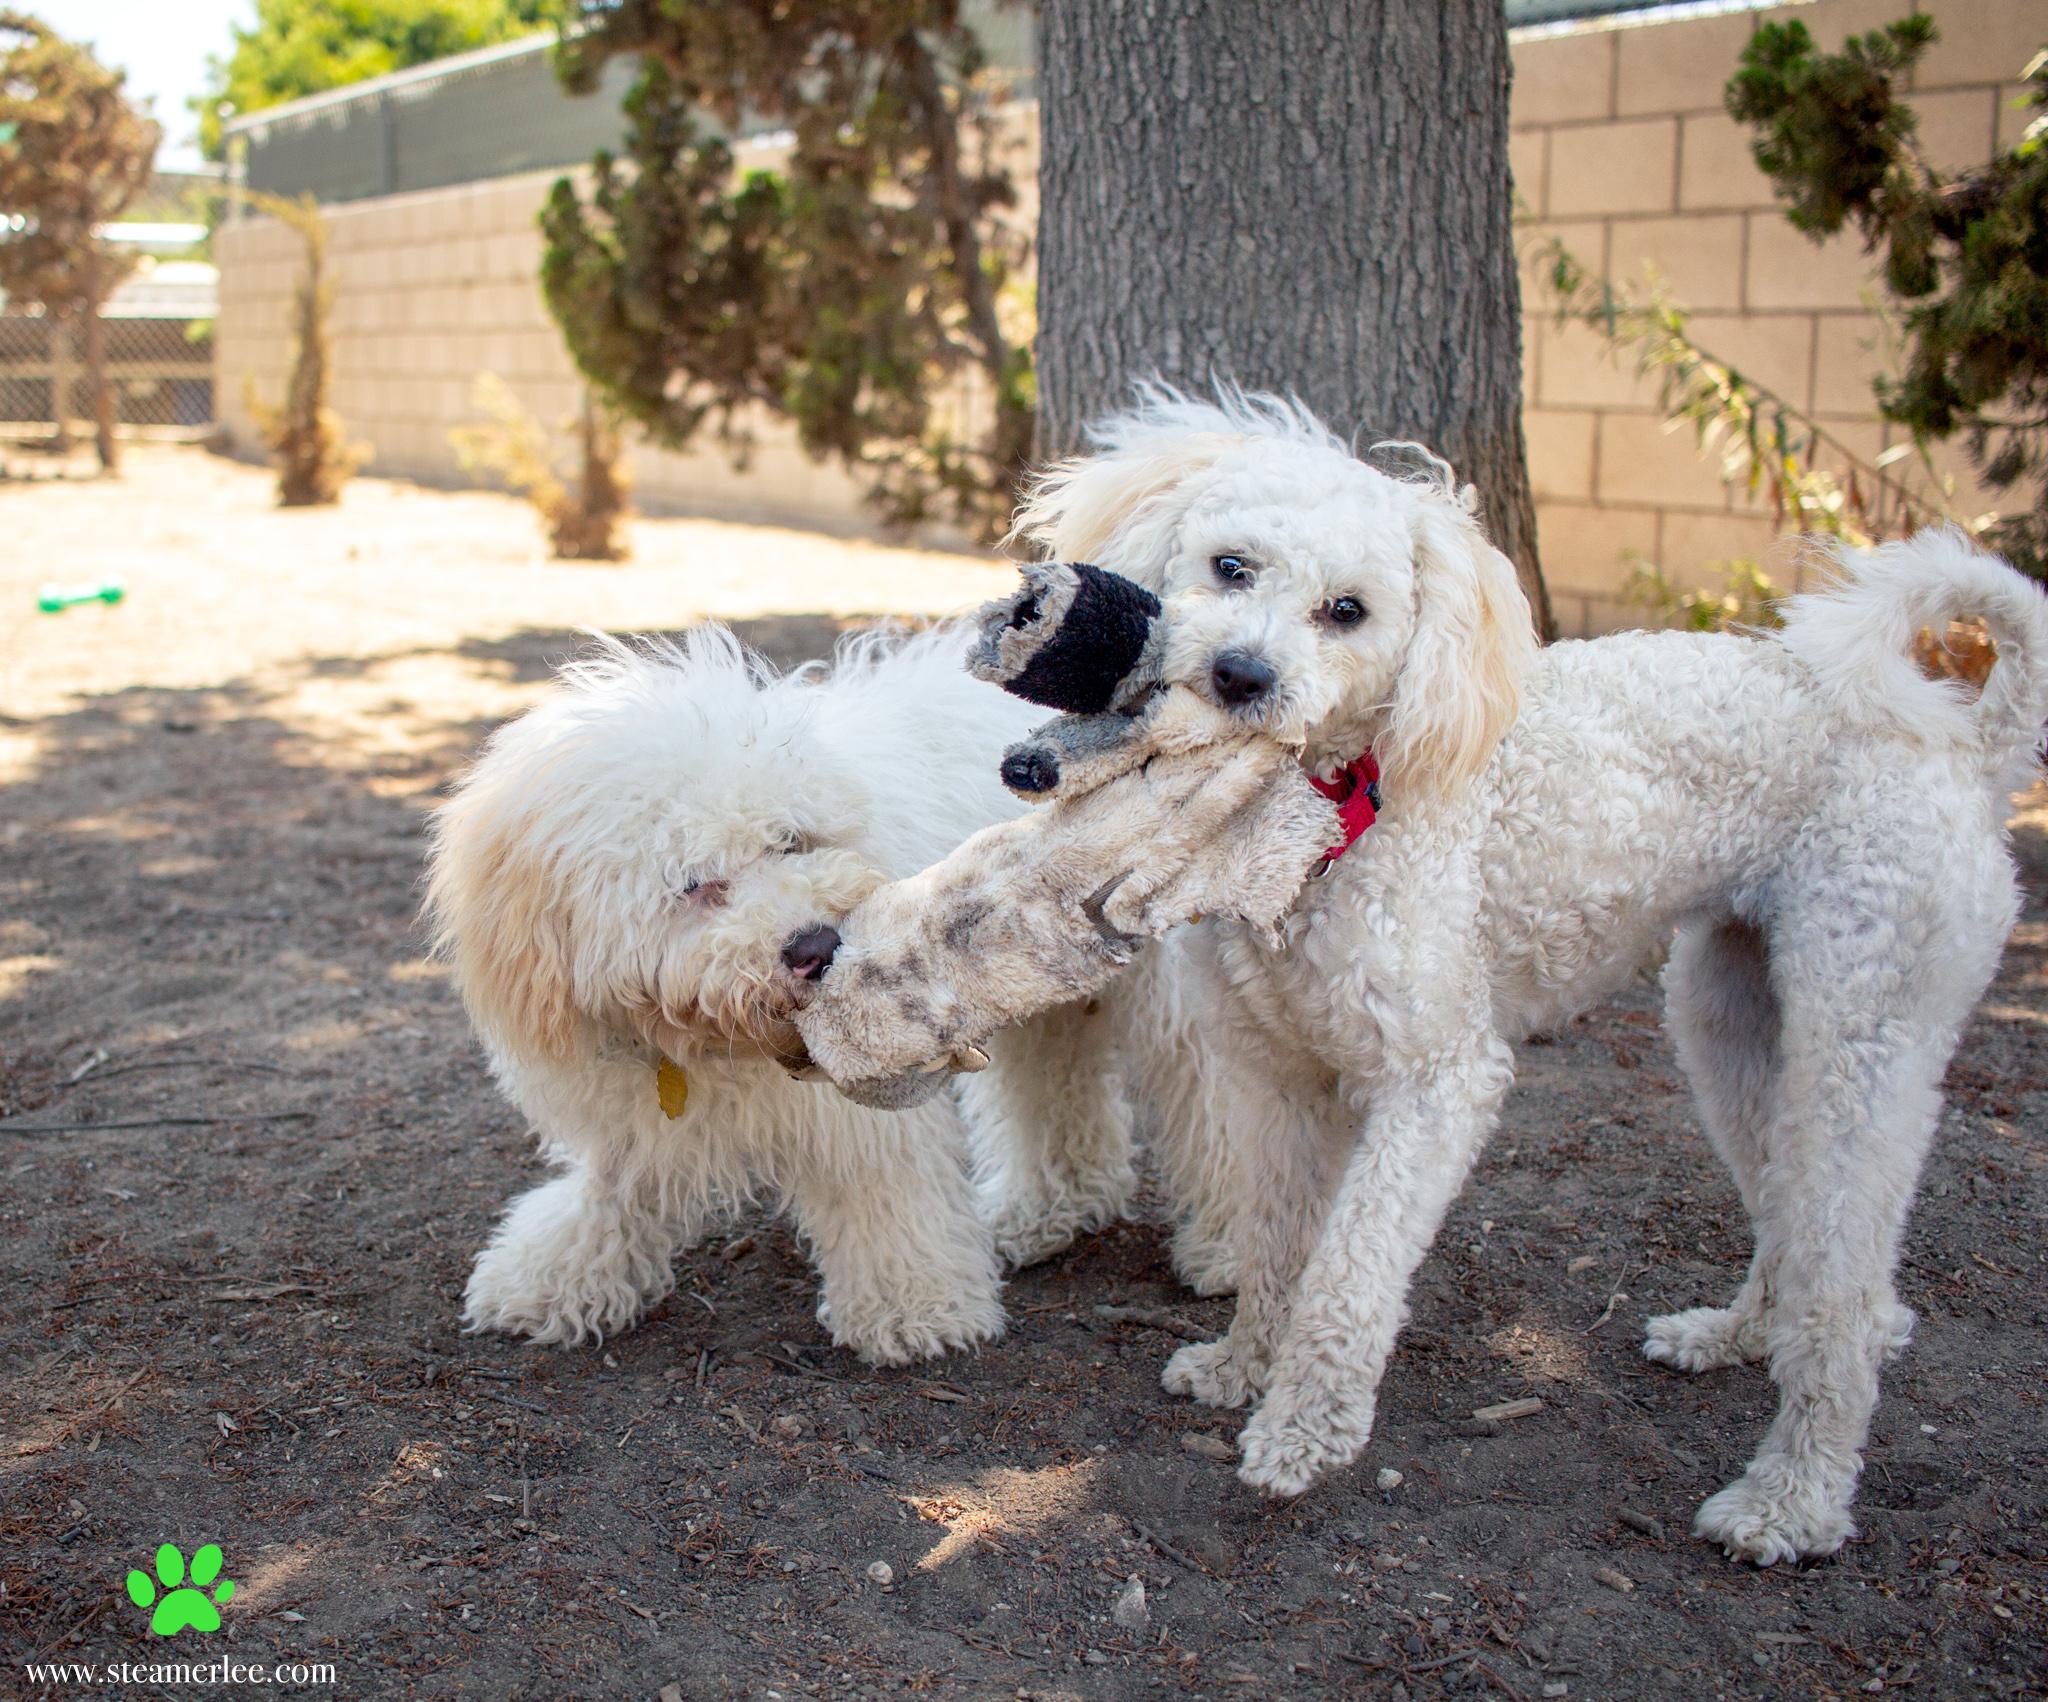 477-Orange-County-Dog-Photography-Steamer-Lee-Southern-California-SBACC.JPG